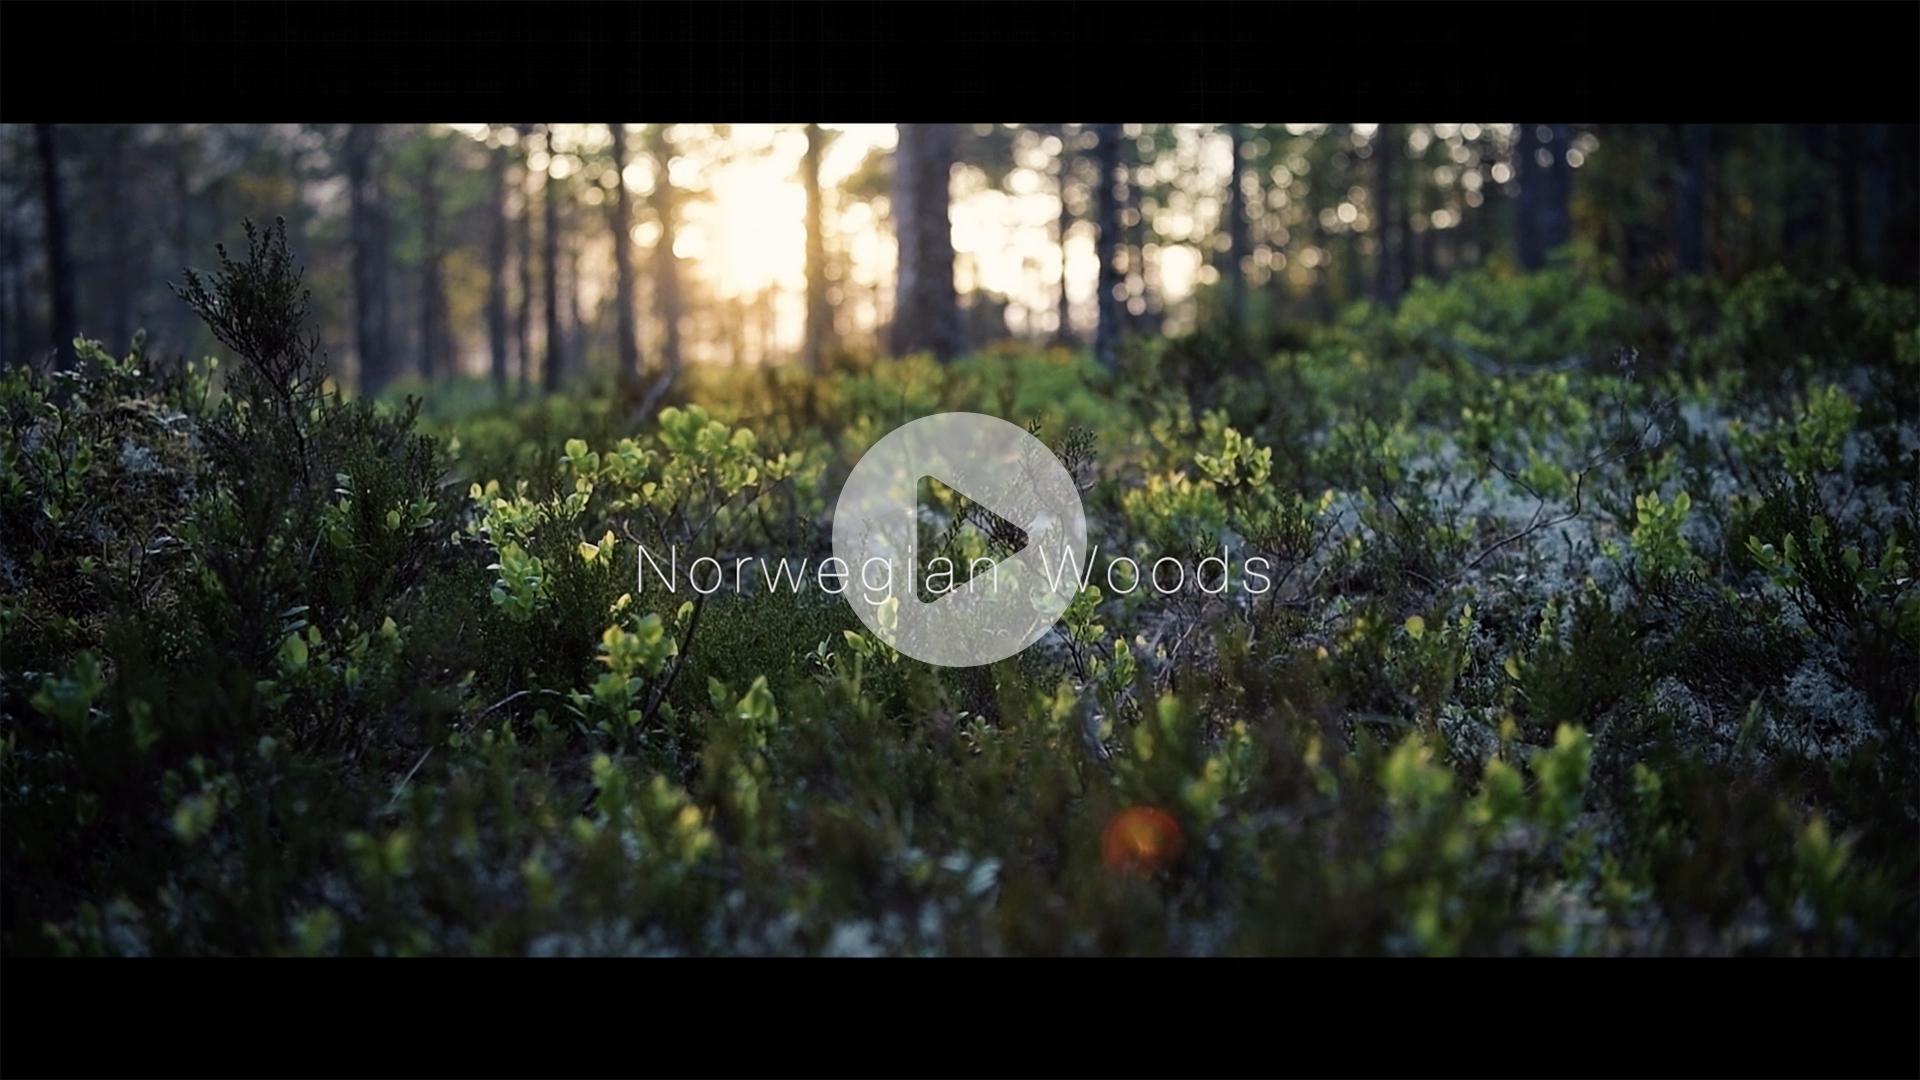 HellwigStudios Reimo - Norwegian Woods